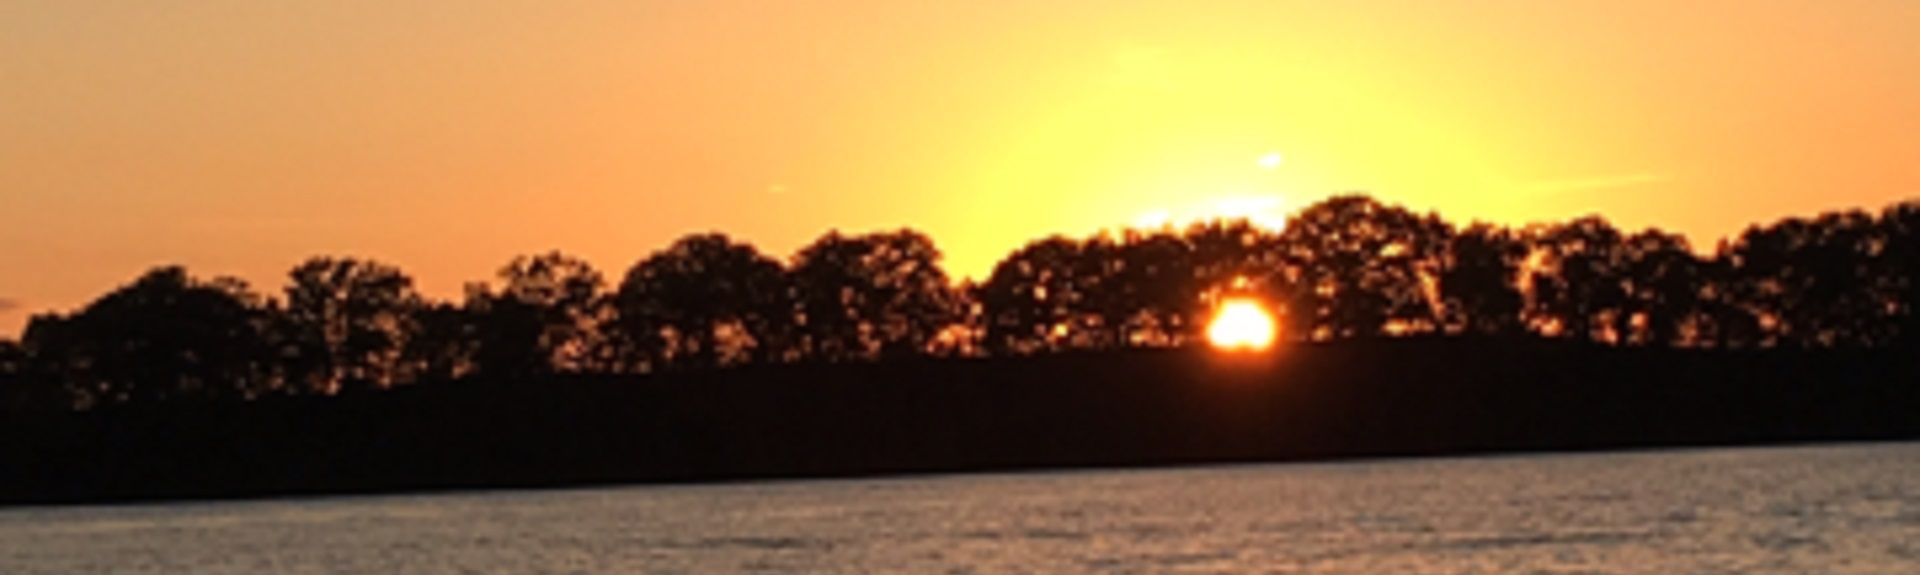 Greenleaf Lake State Recreation Area, Darwin, MN, USA